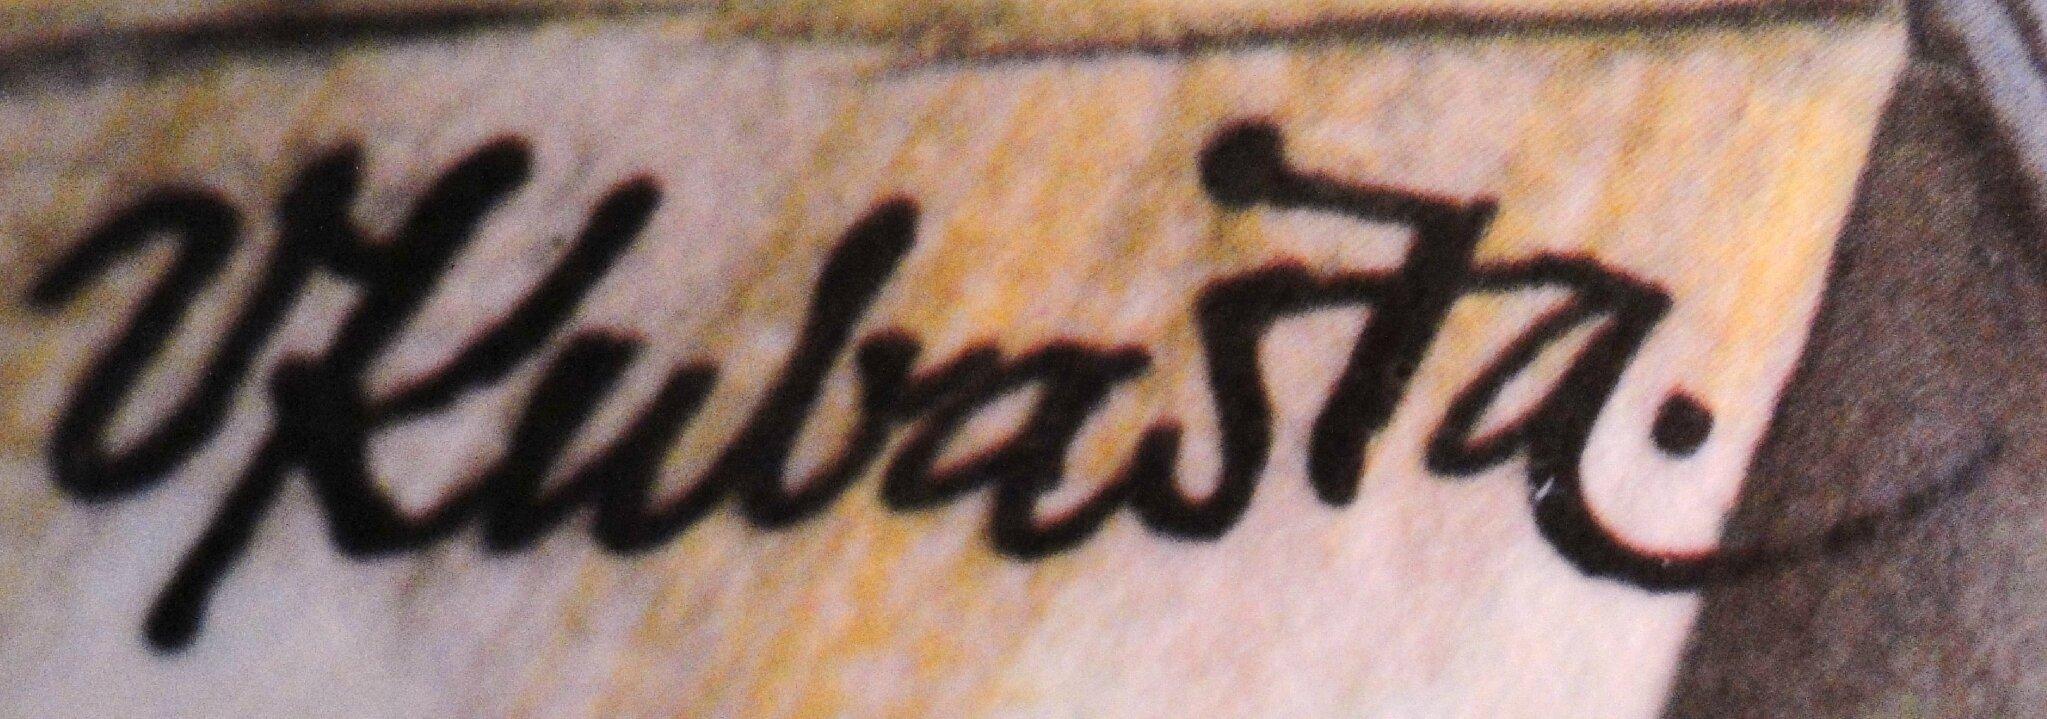 Kubasta signature 1